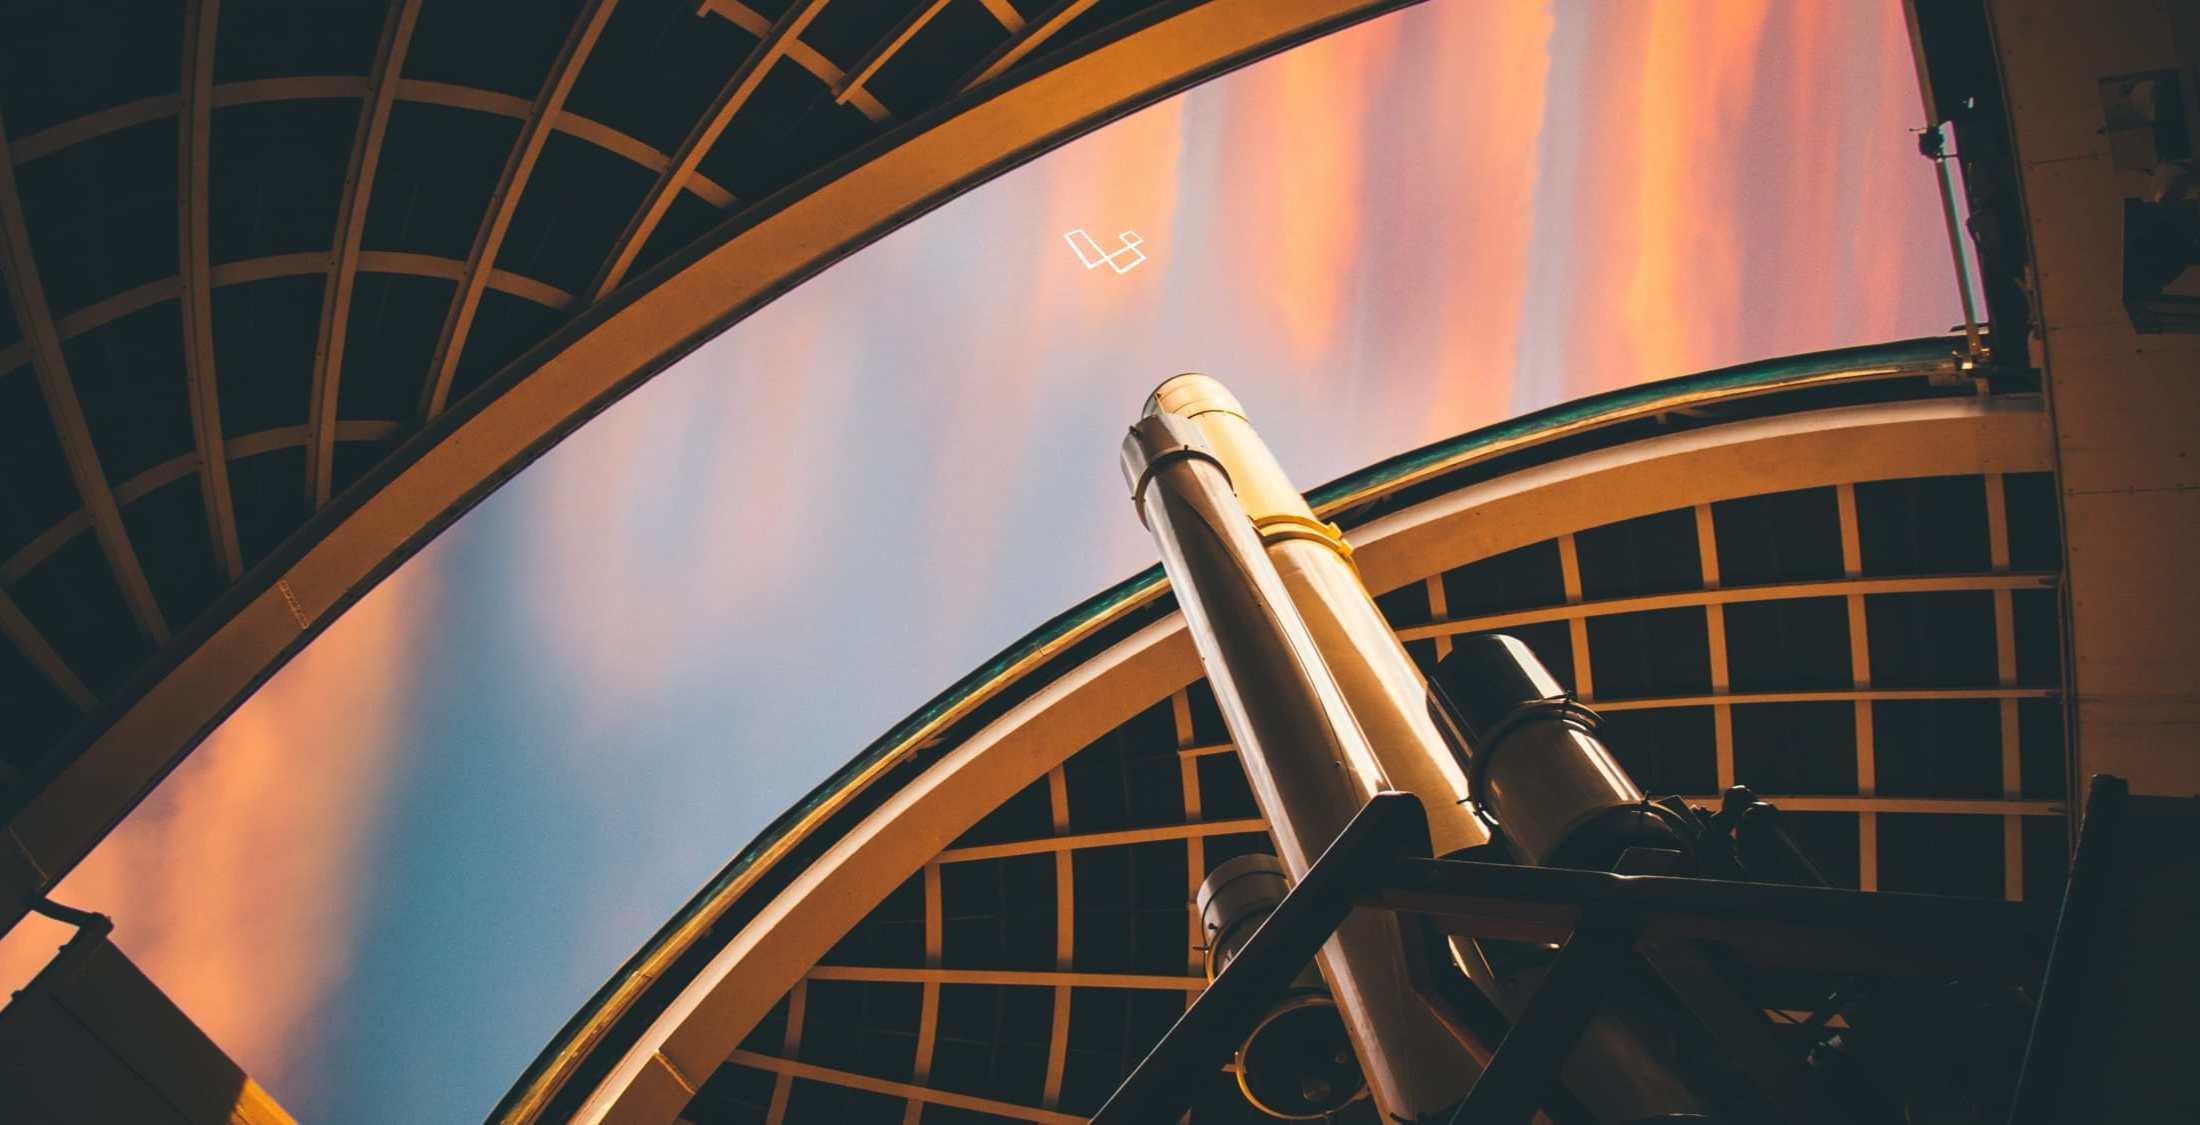 Introducing Laravel Telescope - The Laravel Debugging Assistant